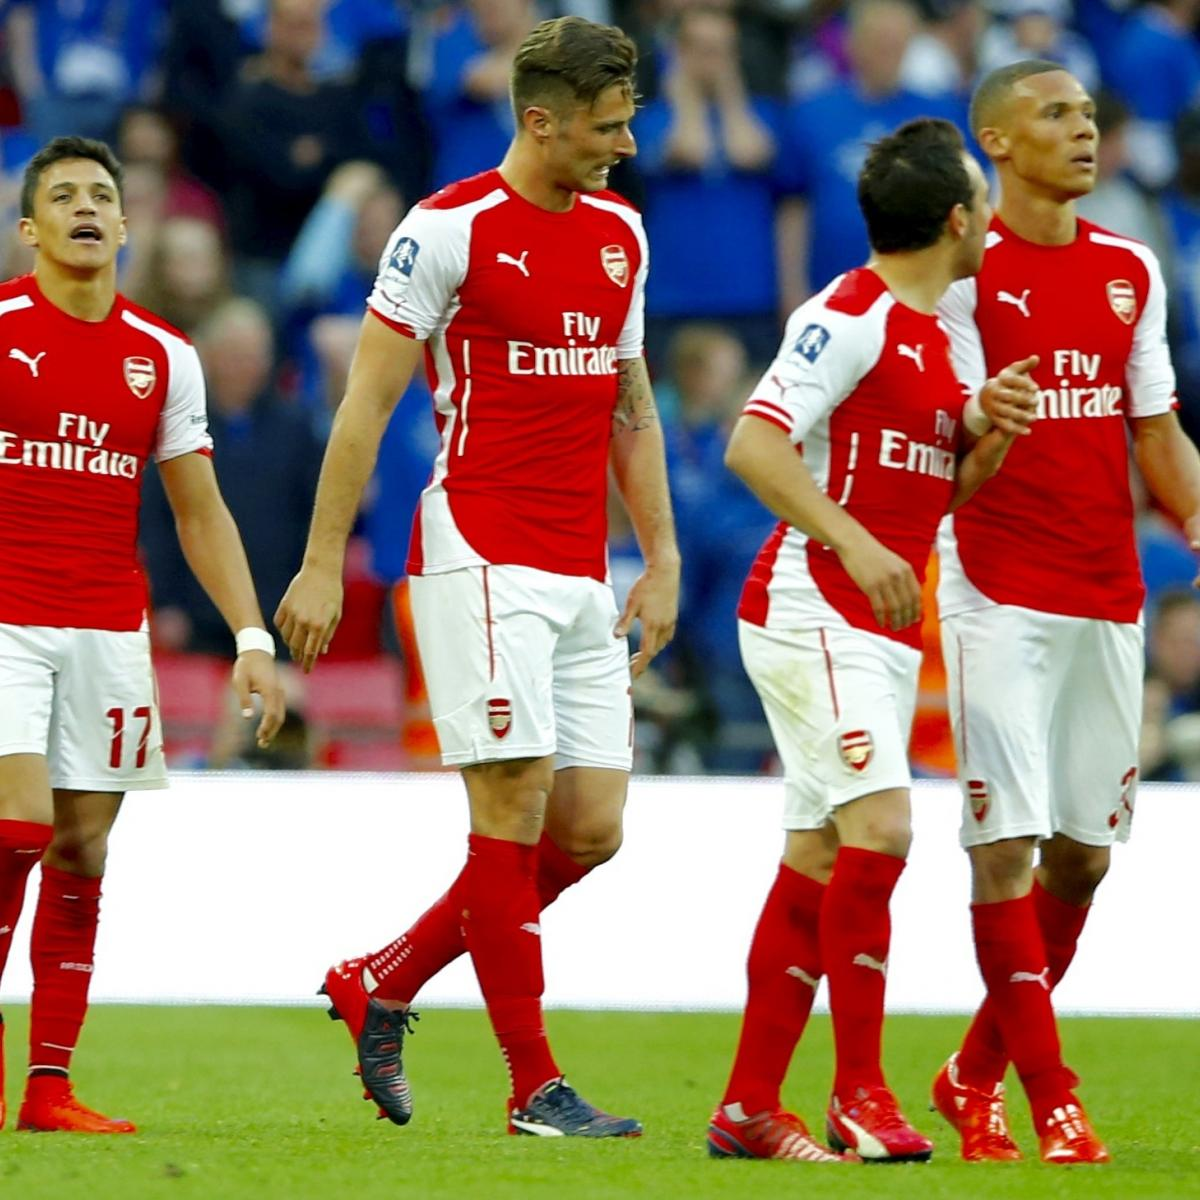 Arsenal Vs Barcelona Live Score Highlights From: Arsenal Vs. Chelsea: Live Score, Highlights From London